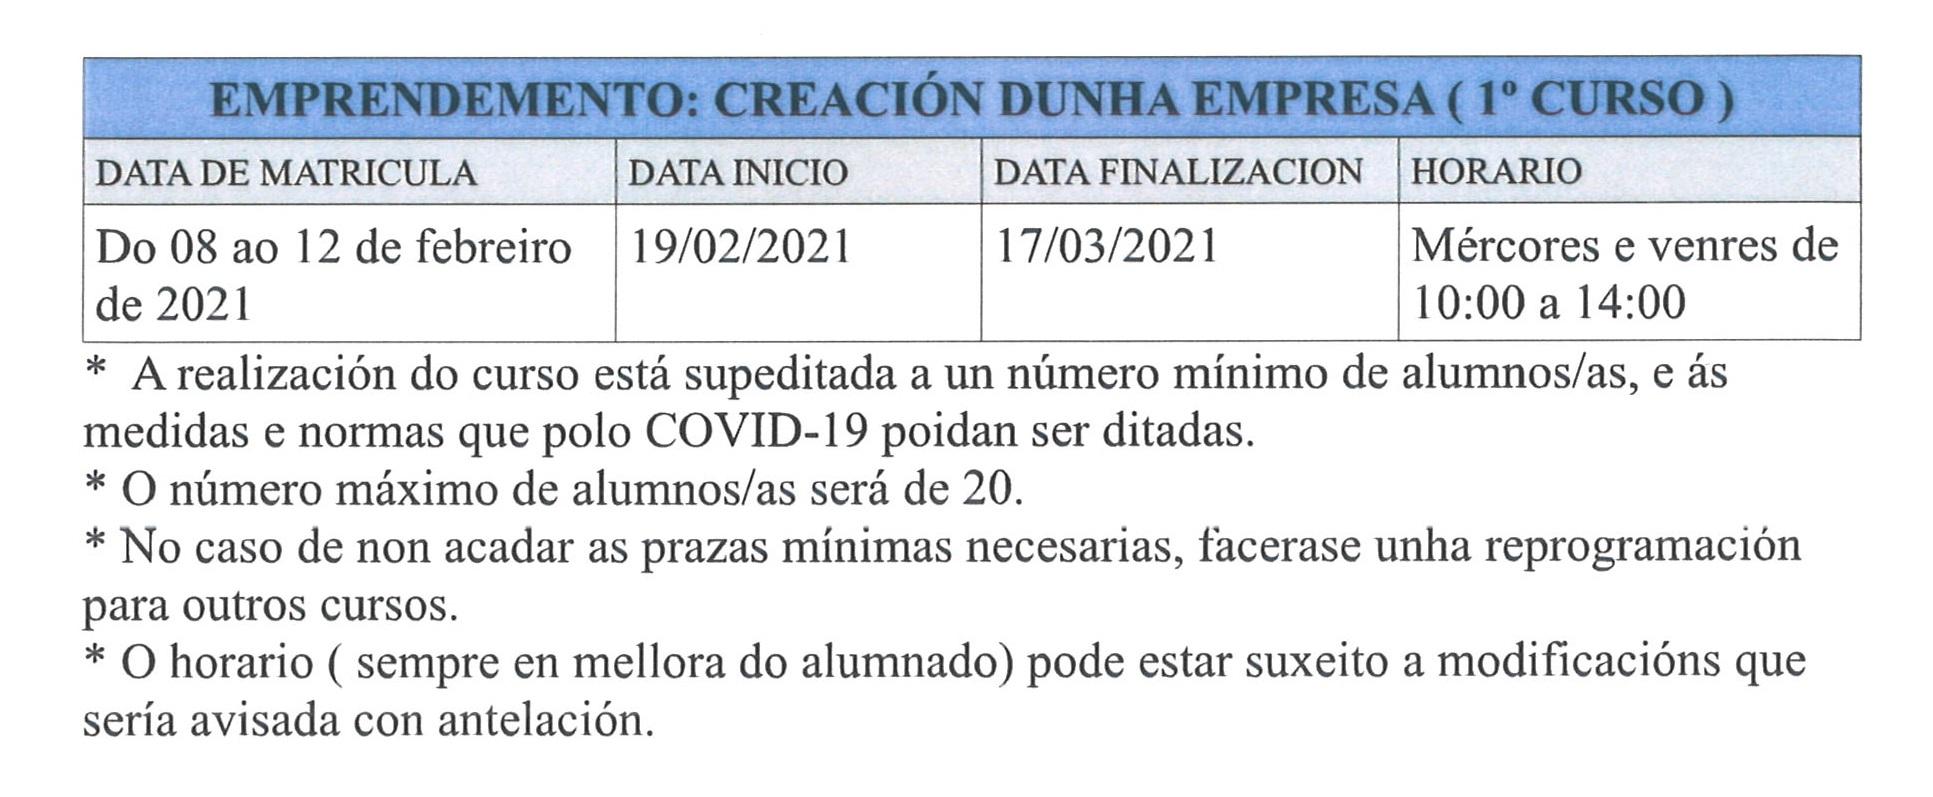 20210201123703_00001